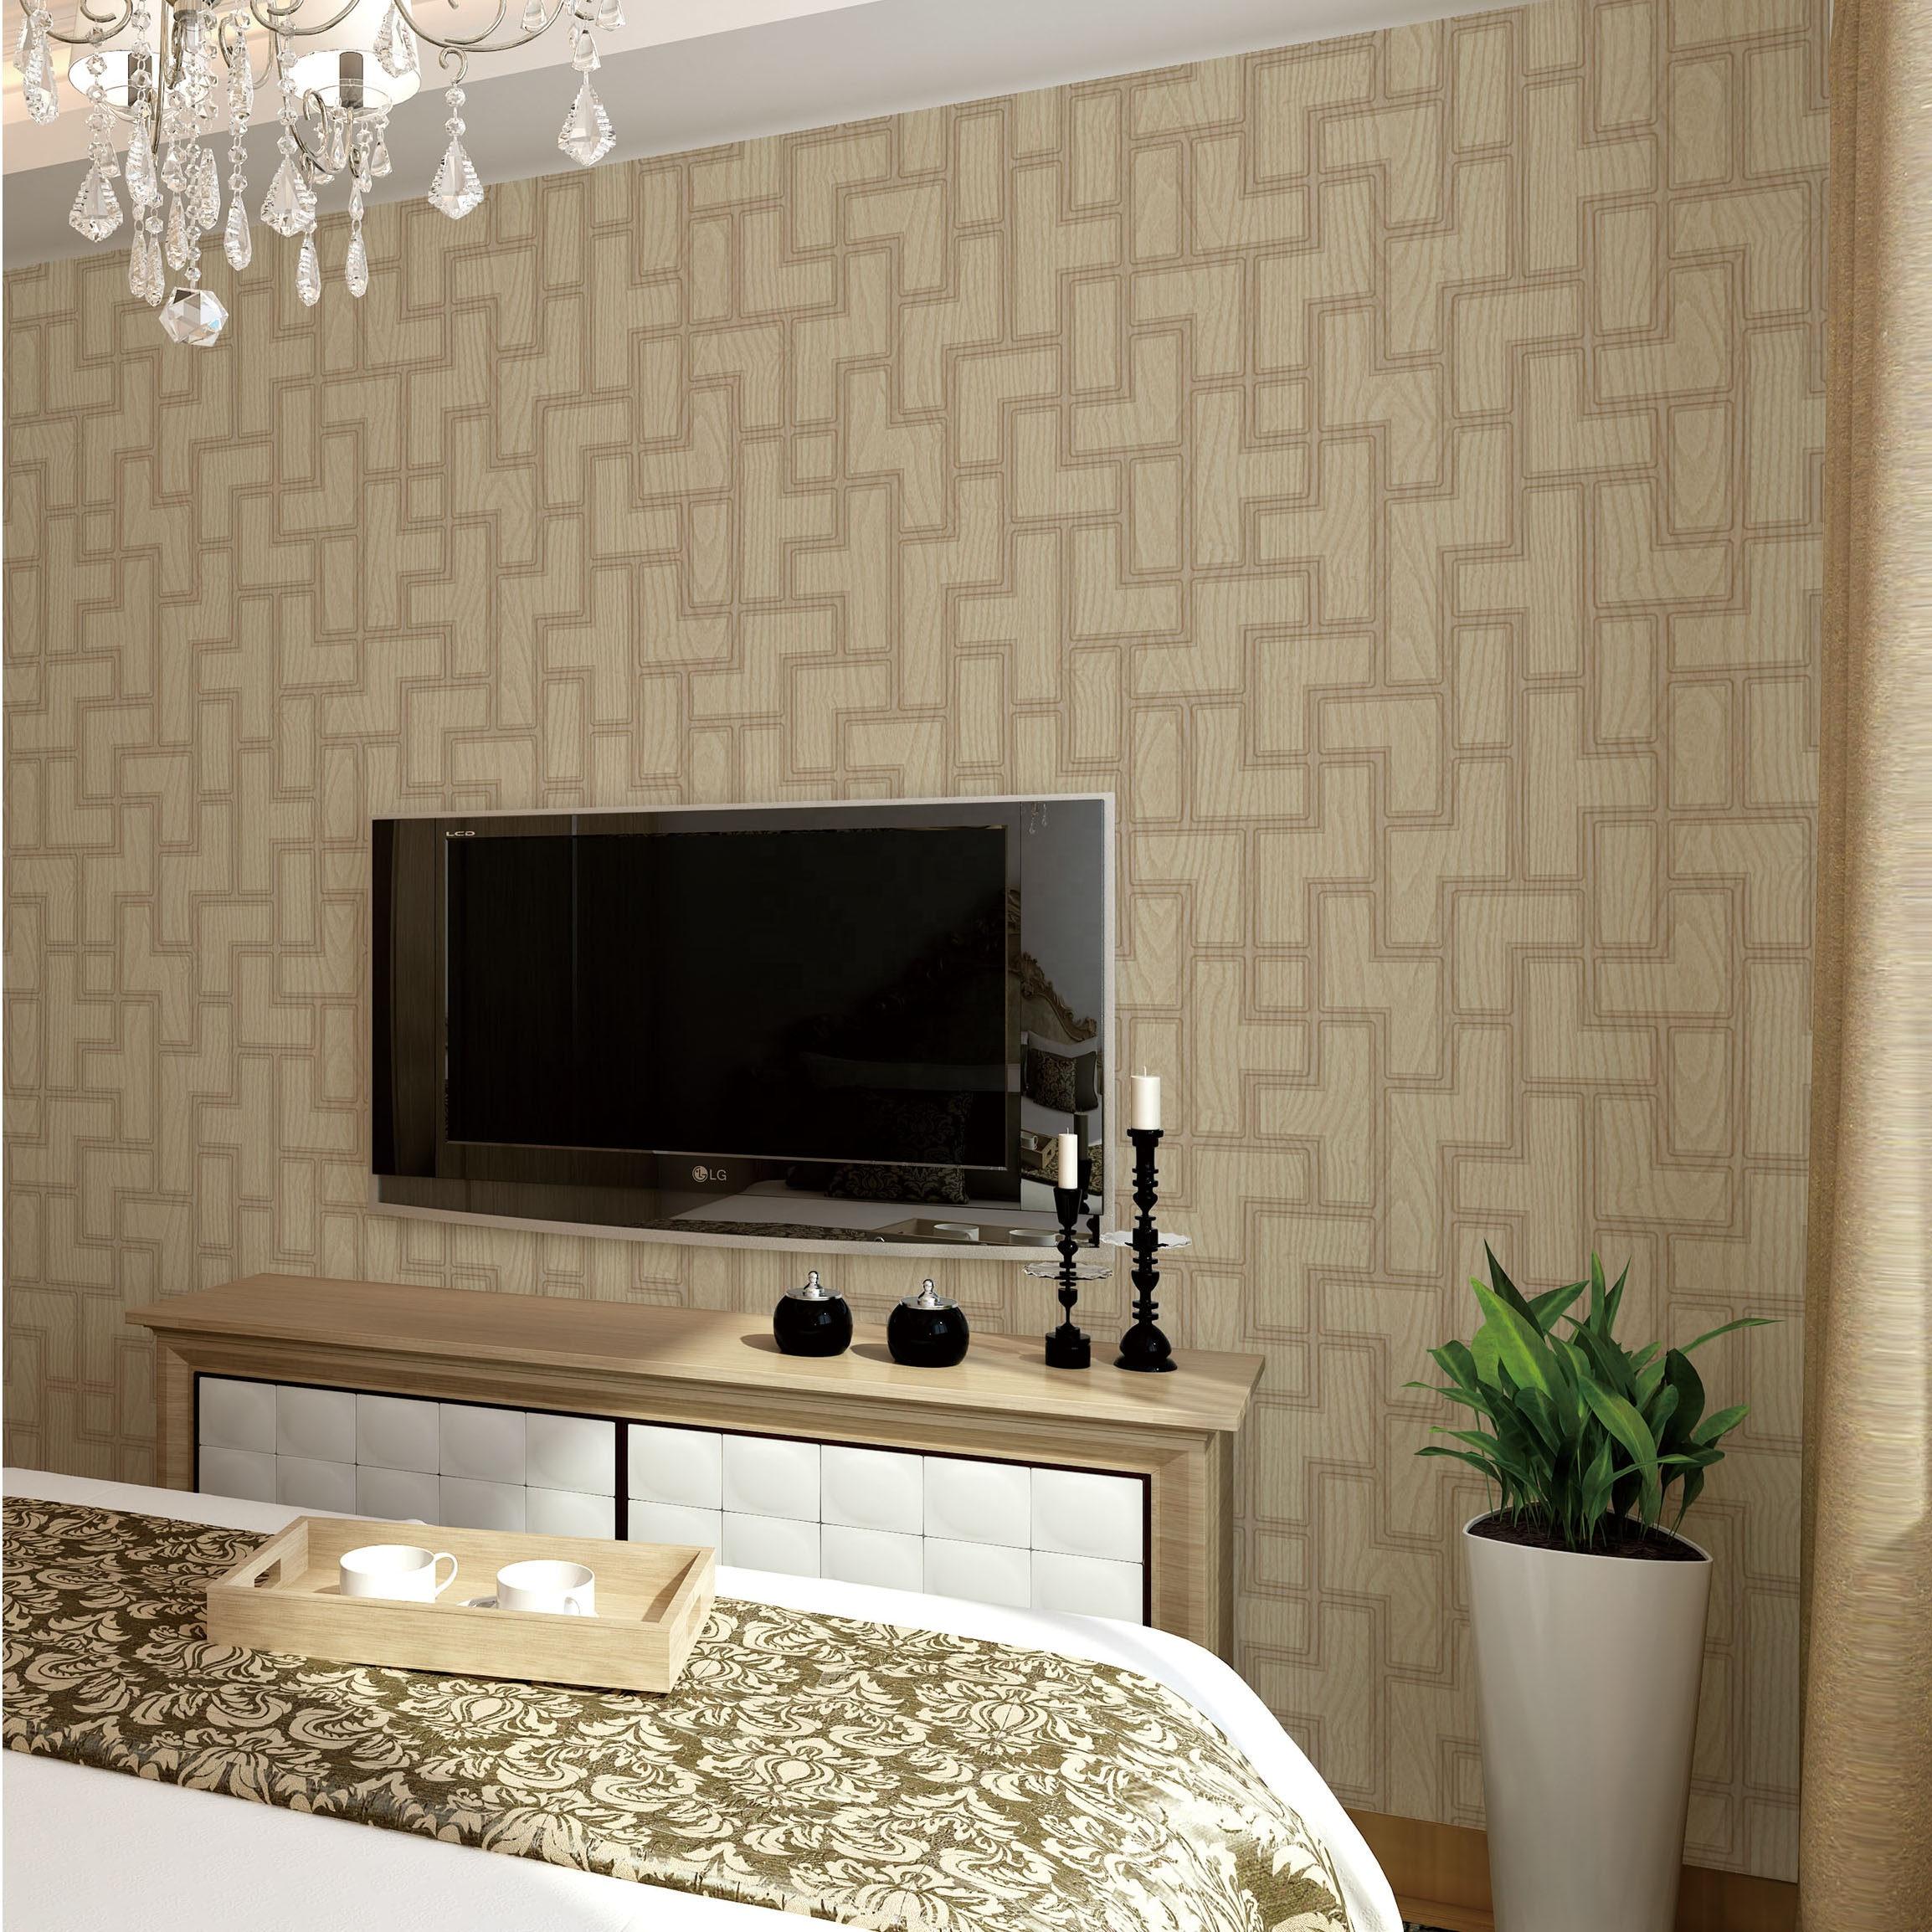 3d Wallpaper For Living Room In Nigeria - allwallpaper